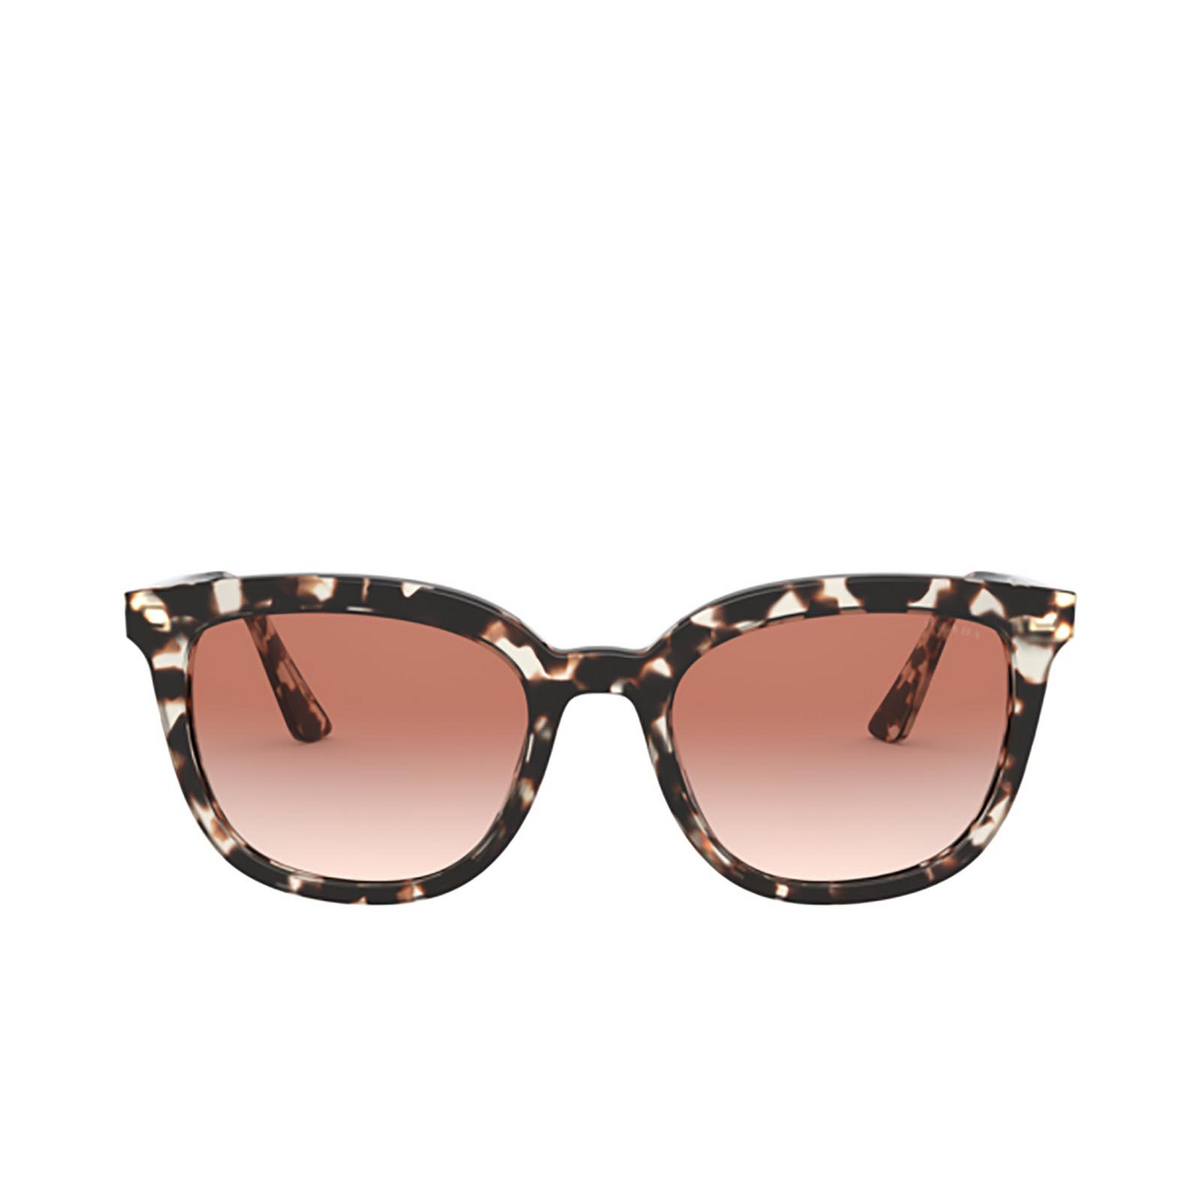 Prada® Square Sunglasses: PR 03XS color Talc Tortoise UAO2F1.